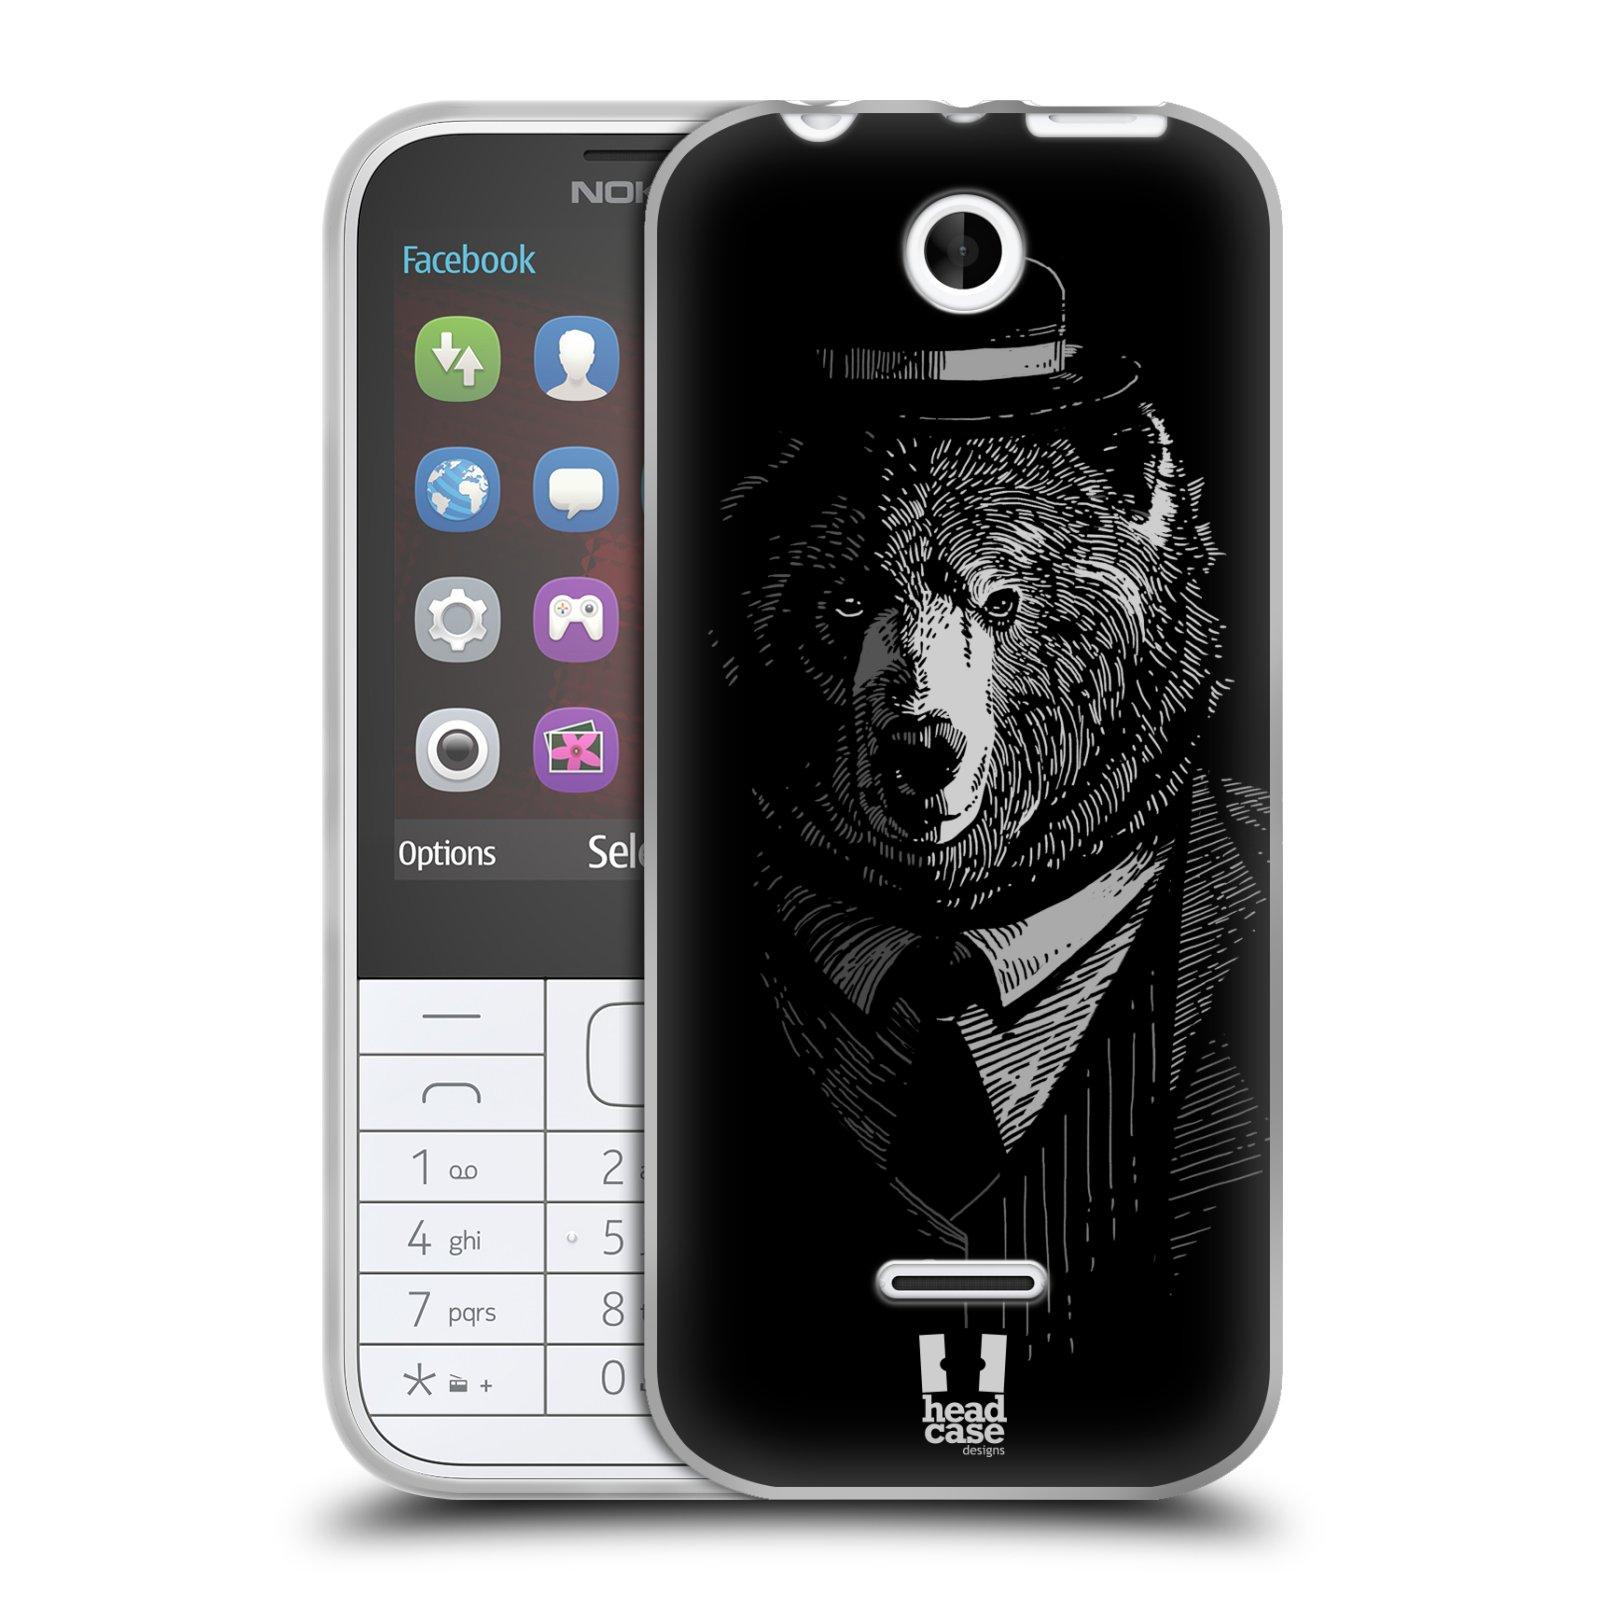 Silikonové pouzdro na mobil Nokia 225 HEAD CASE MEDVĚD V KVÁDRU (Silikonový kryt či obal na mobilní telefon Nokia 225)